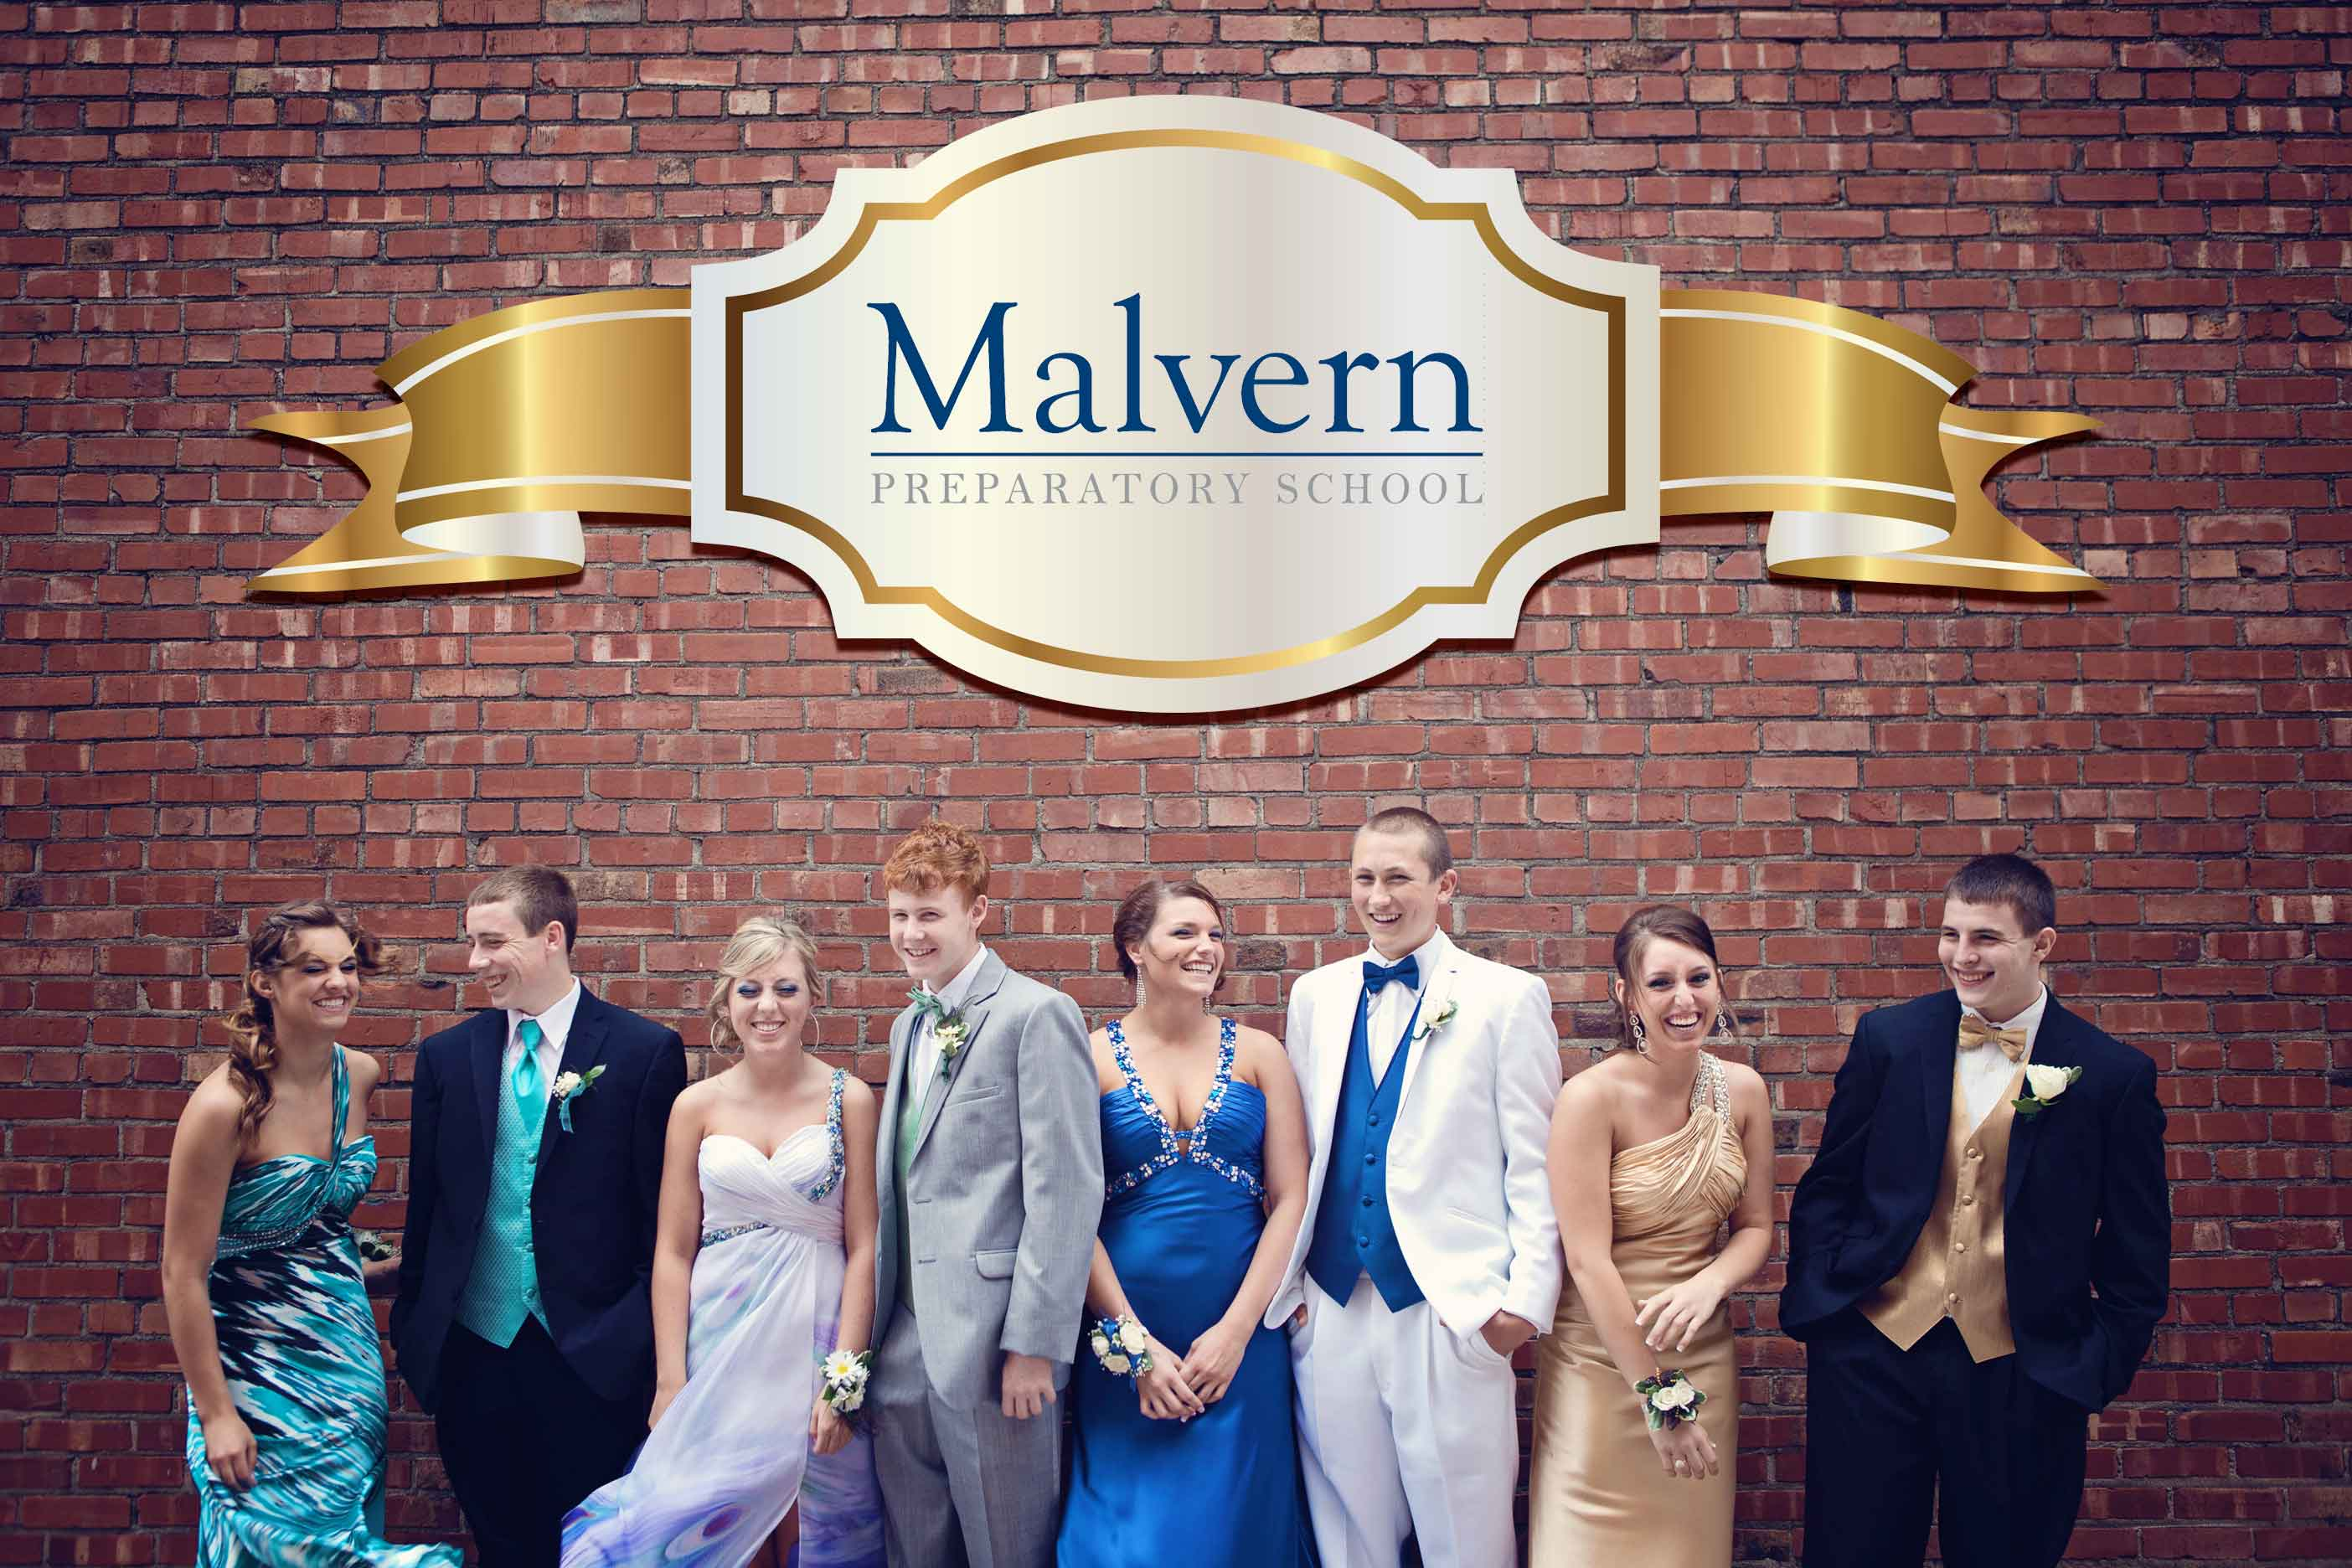 malvern preparatory school prom